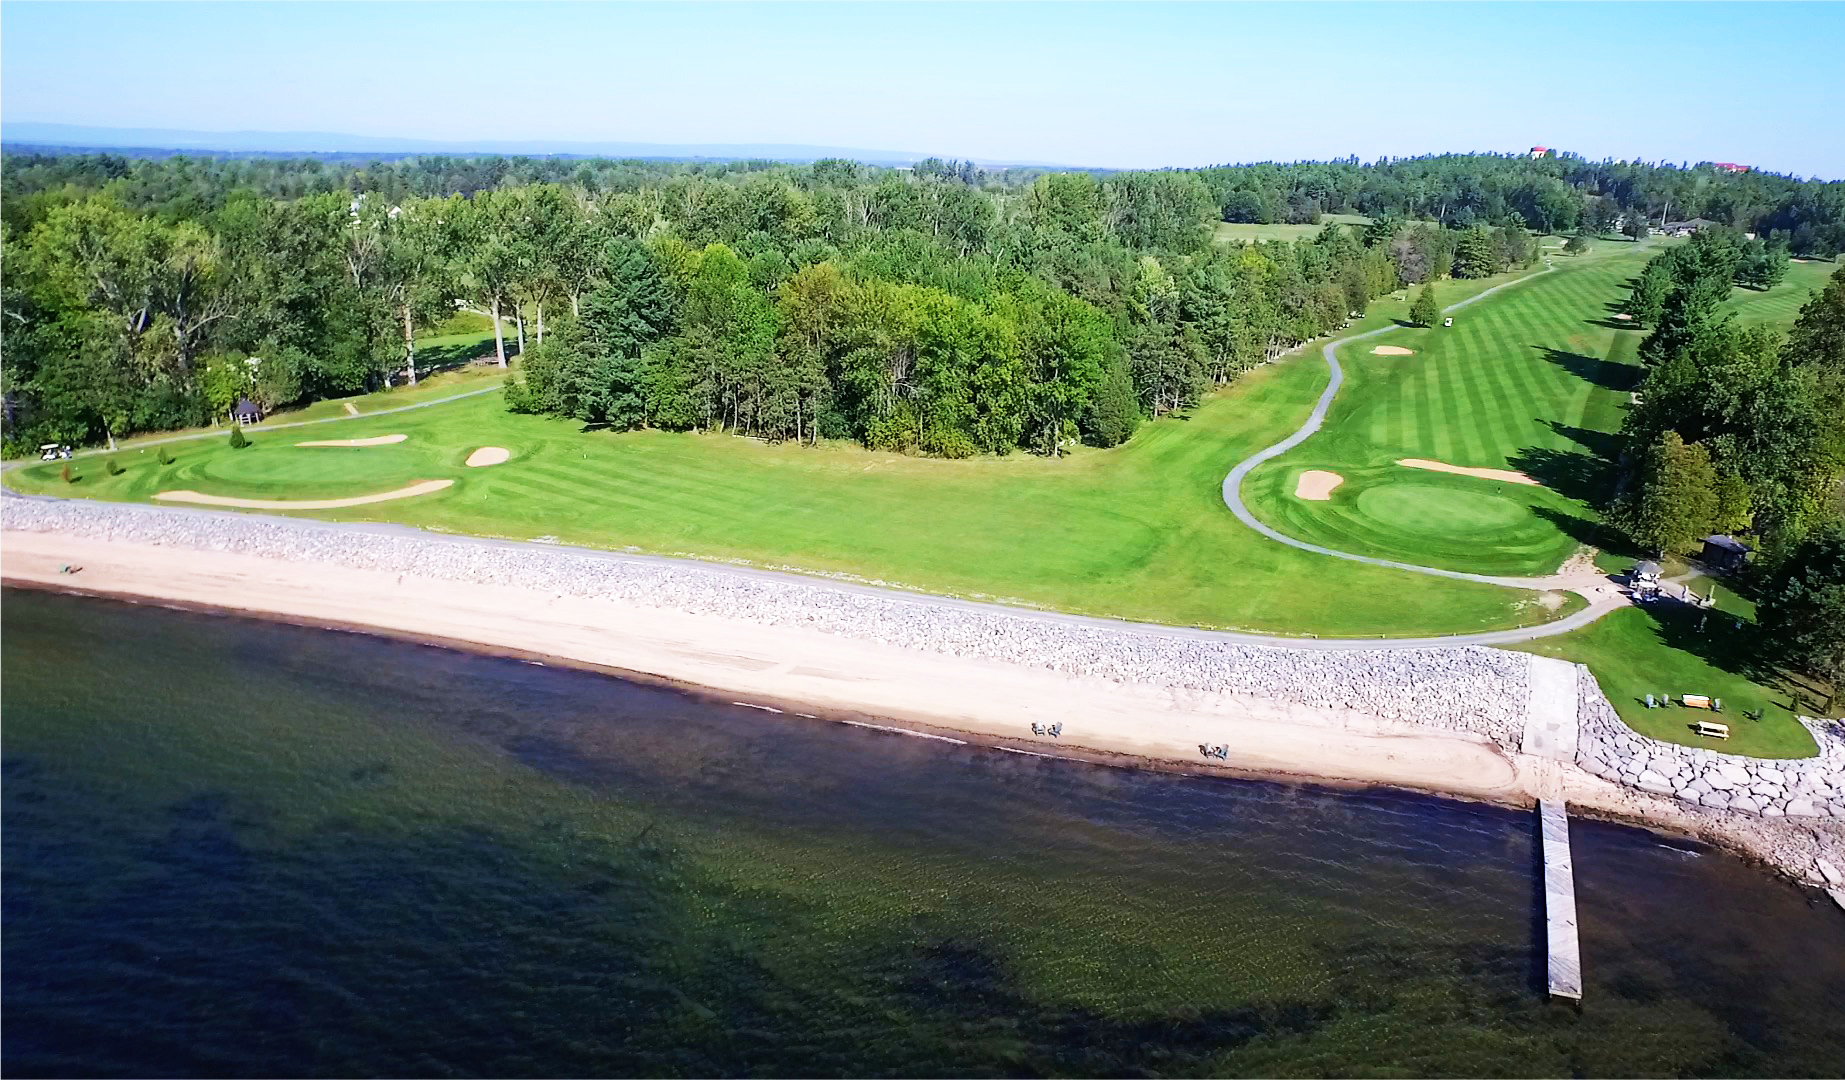 northern exposure golf destinations u2013 new england golf monthly